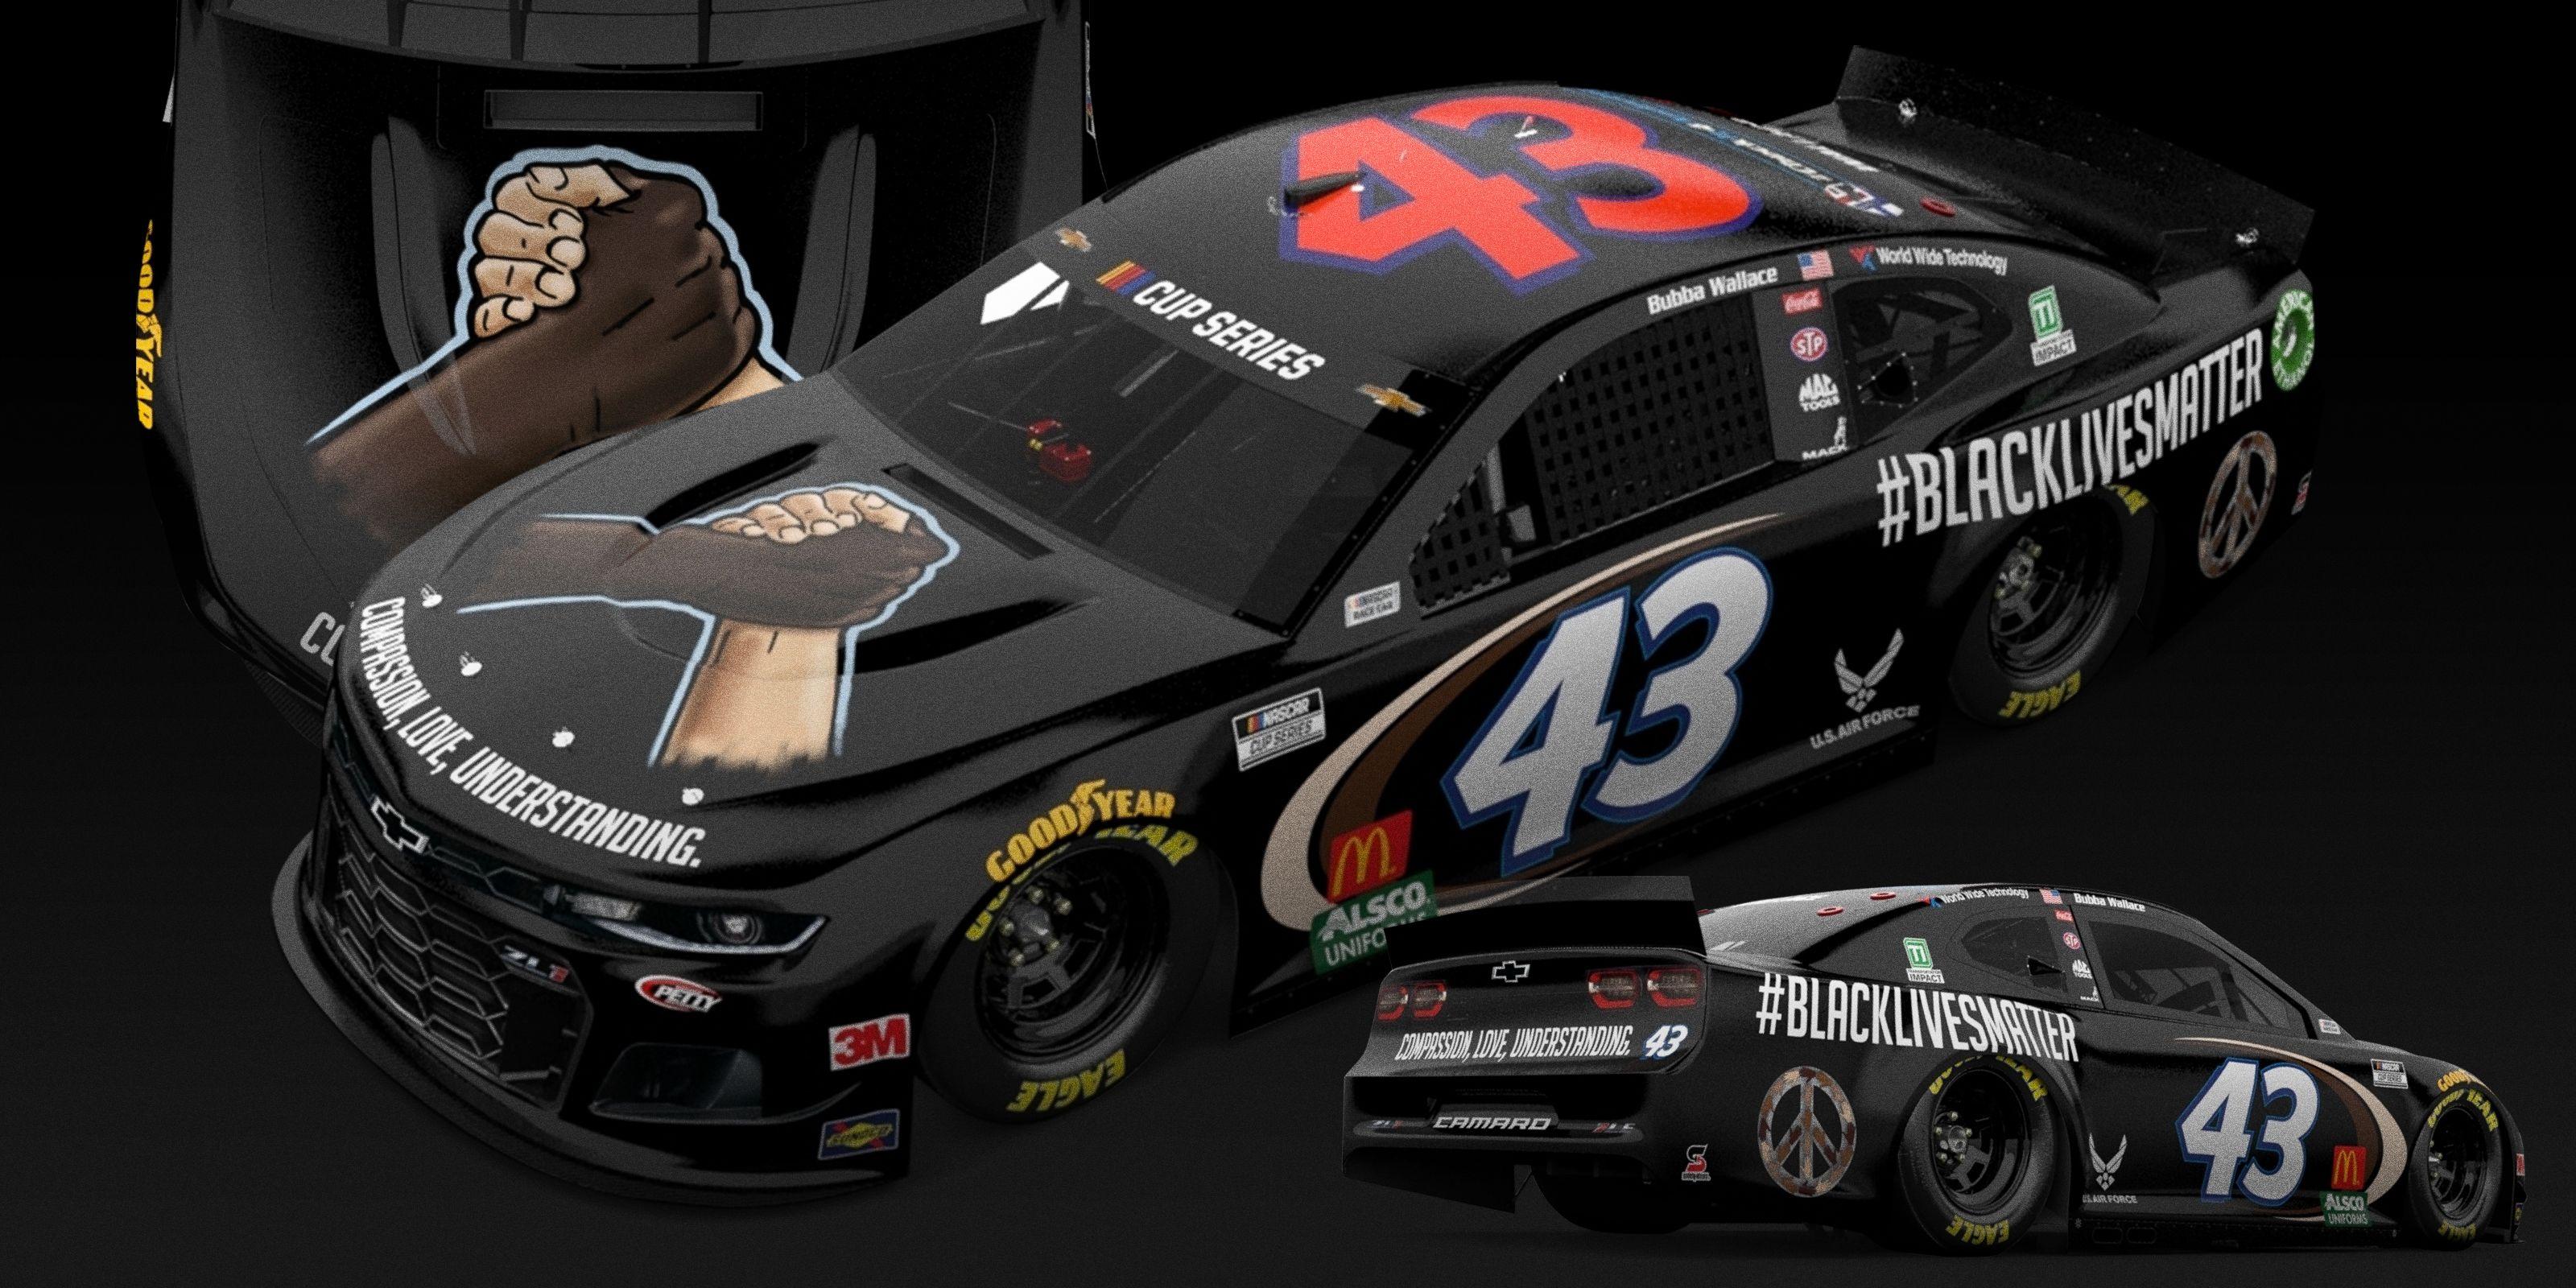 Bubba Wallace To Race Blacklivesmatter Car